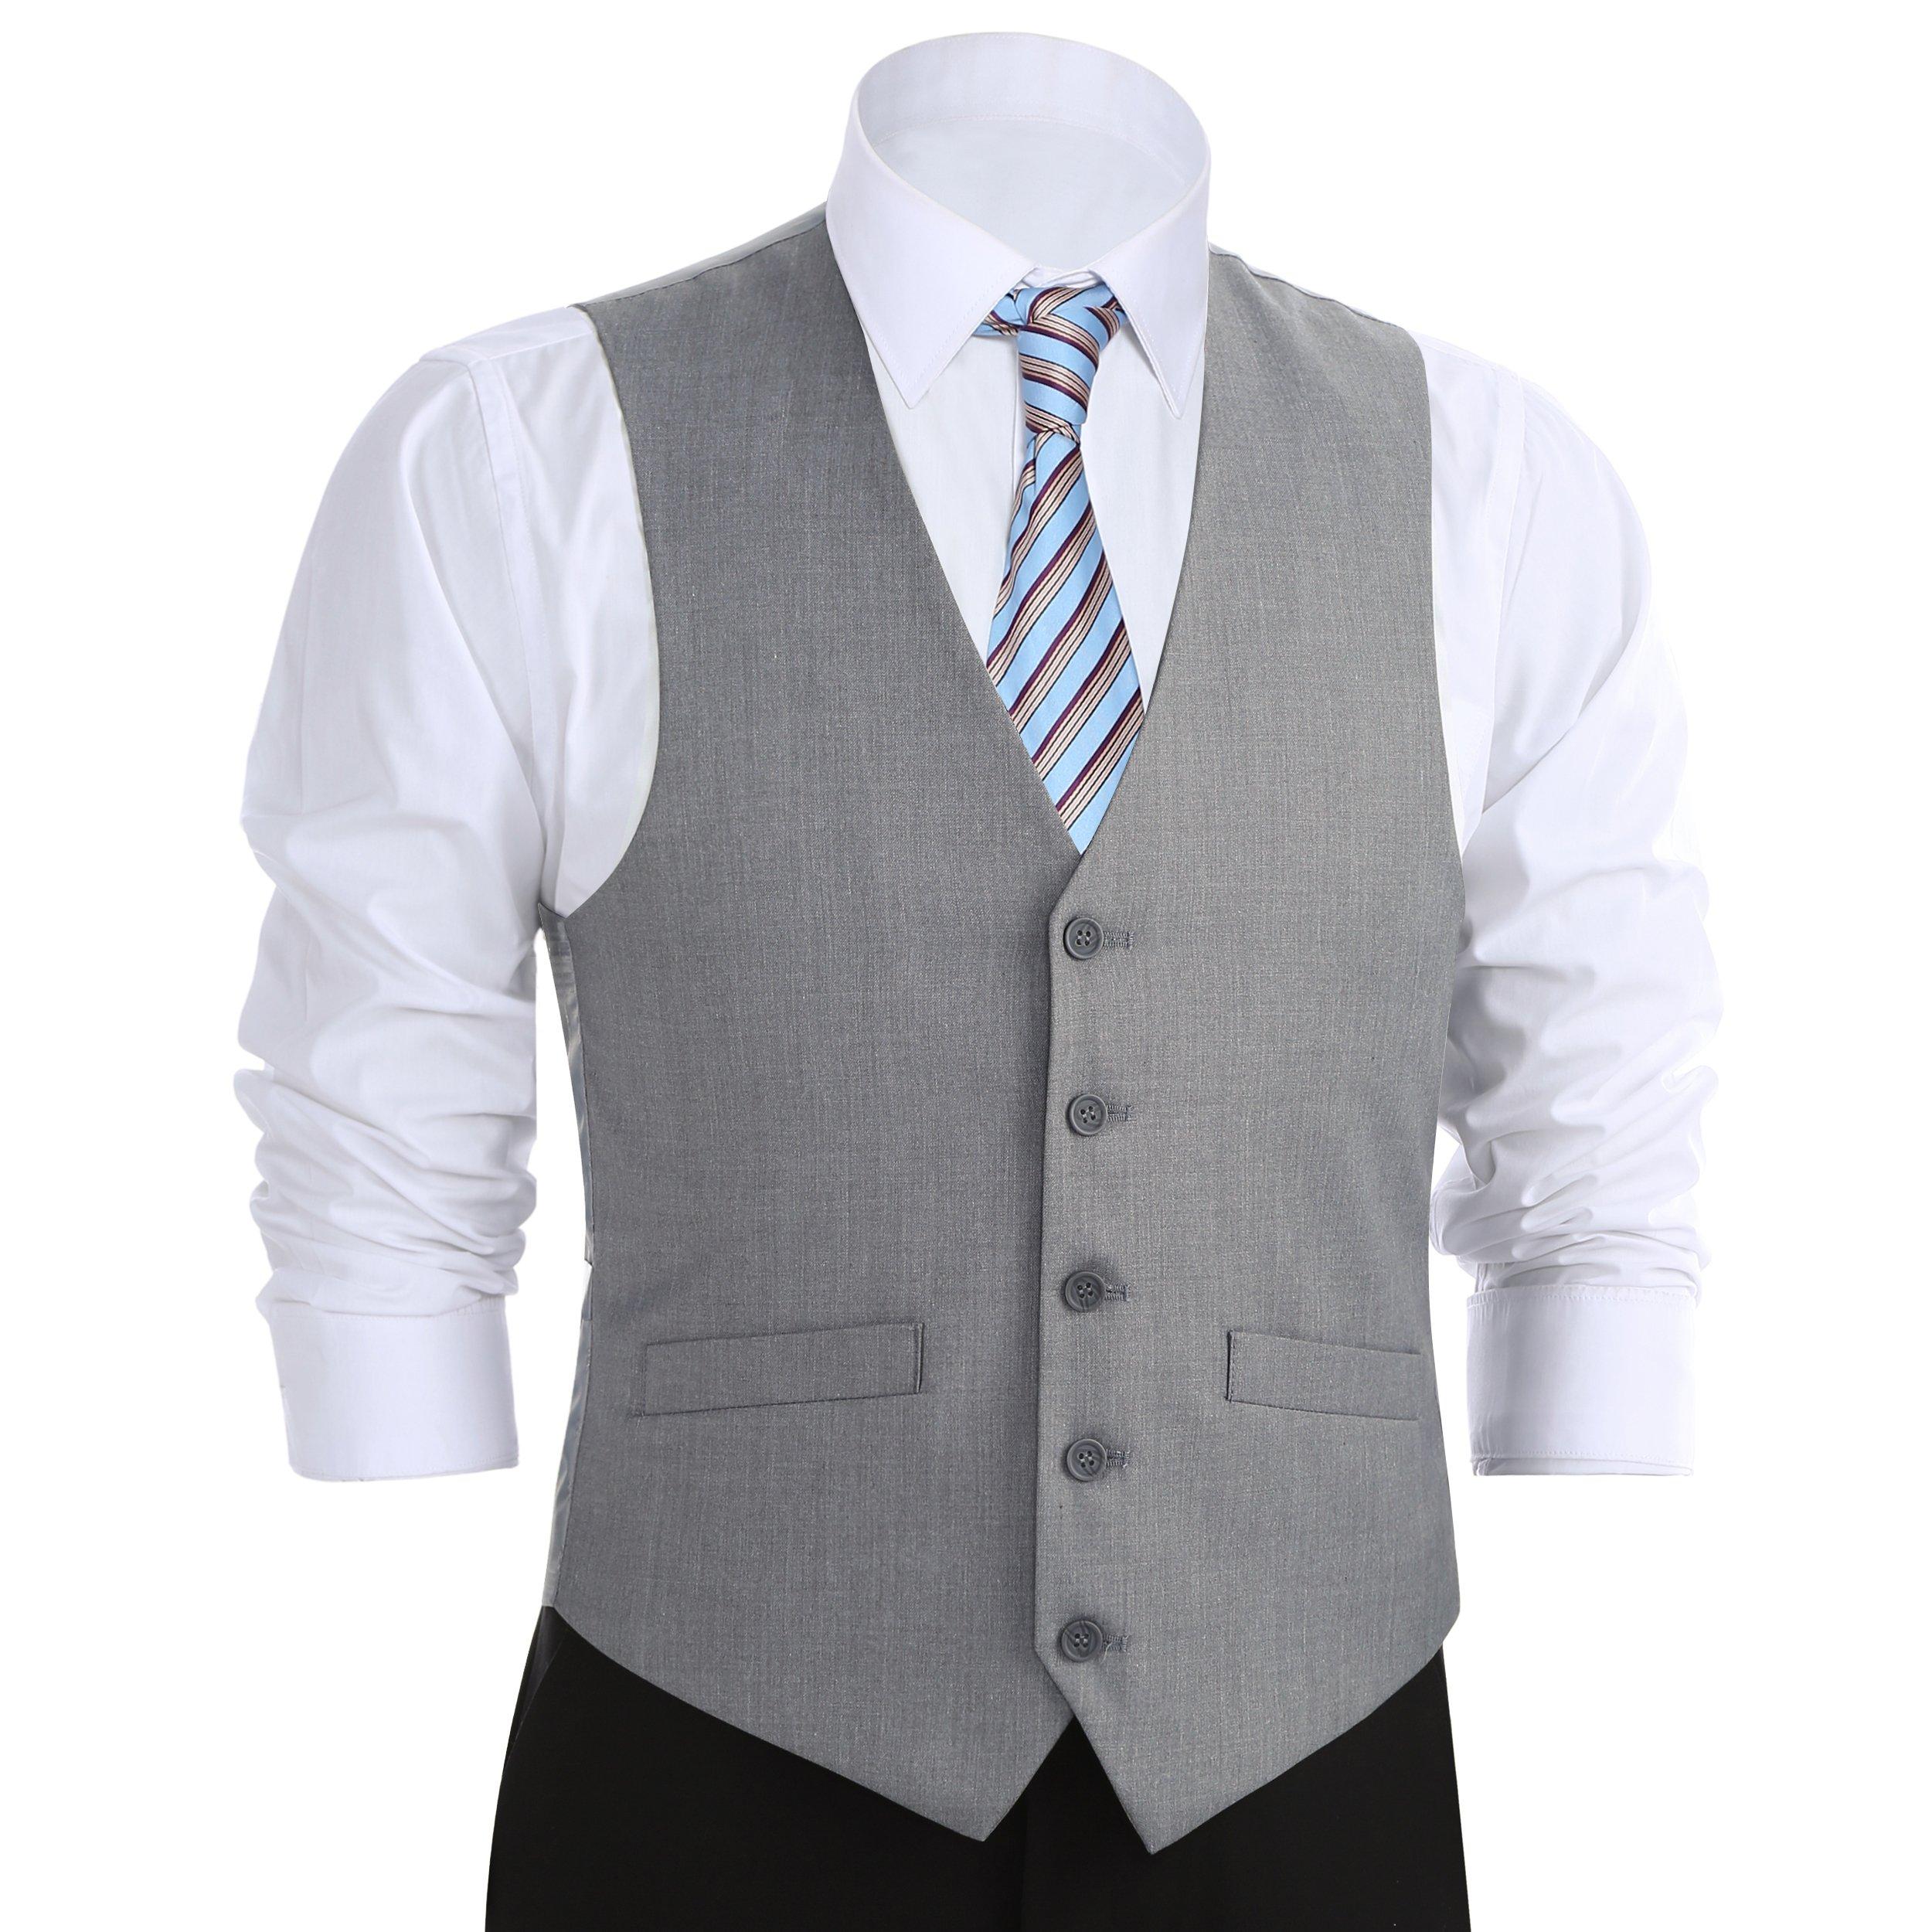 Chama Men's Formal Classic Fit Business Dress Suit Button Down Vest Waistcoat (50 Regular, Light Grey)